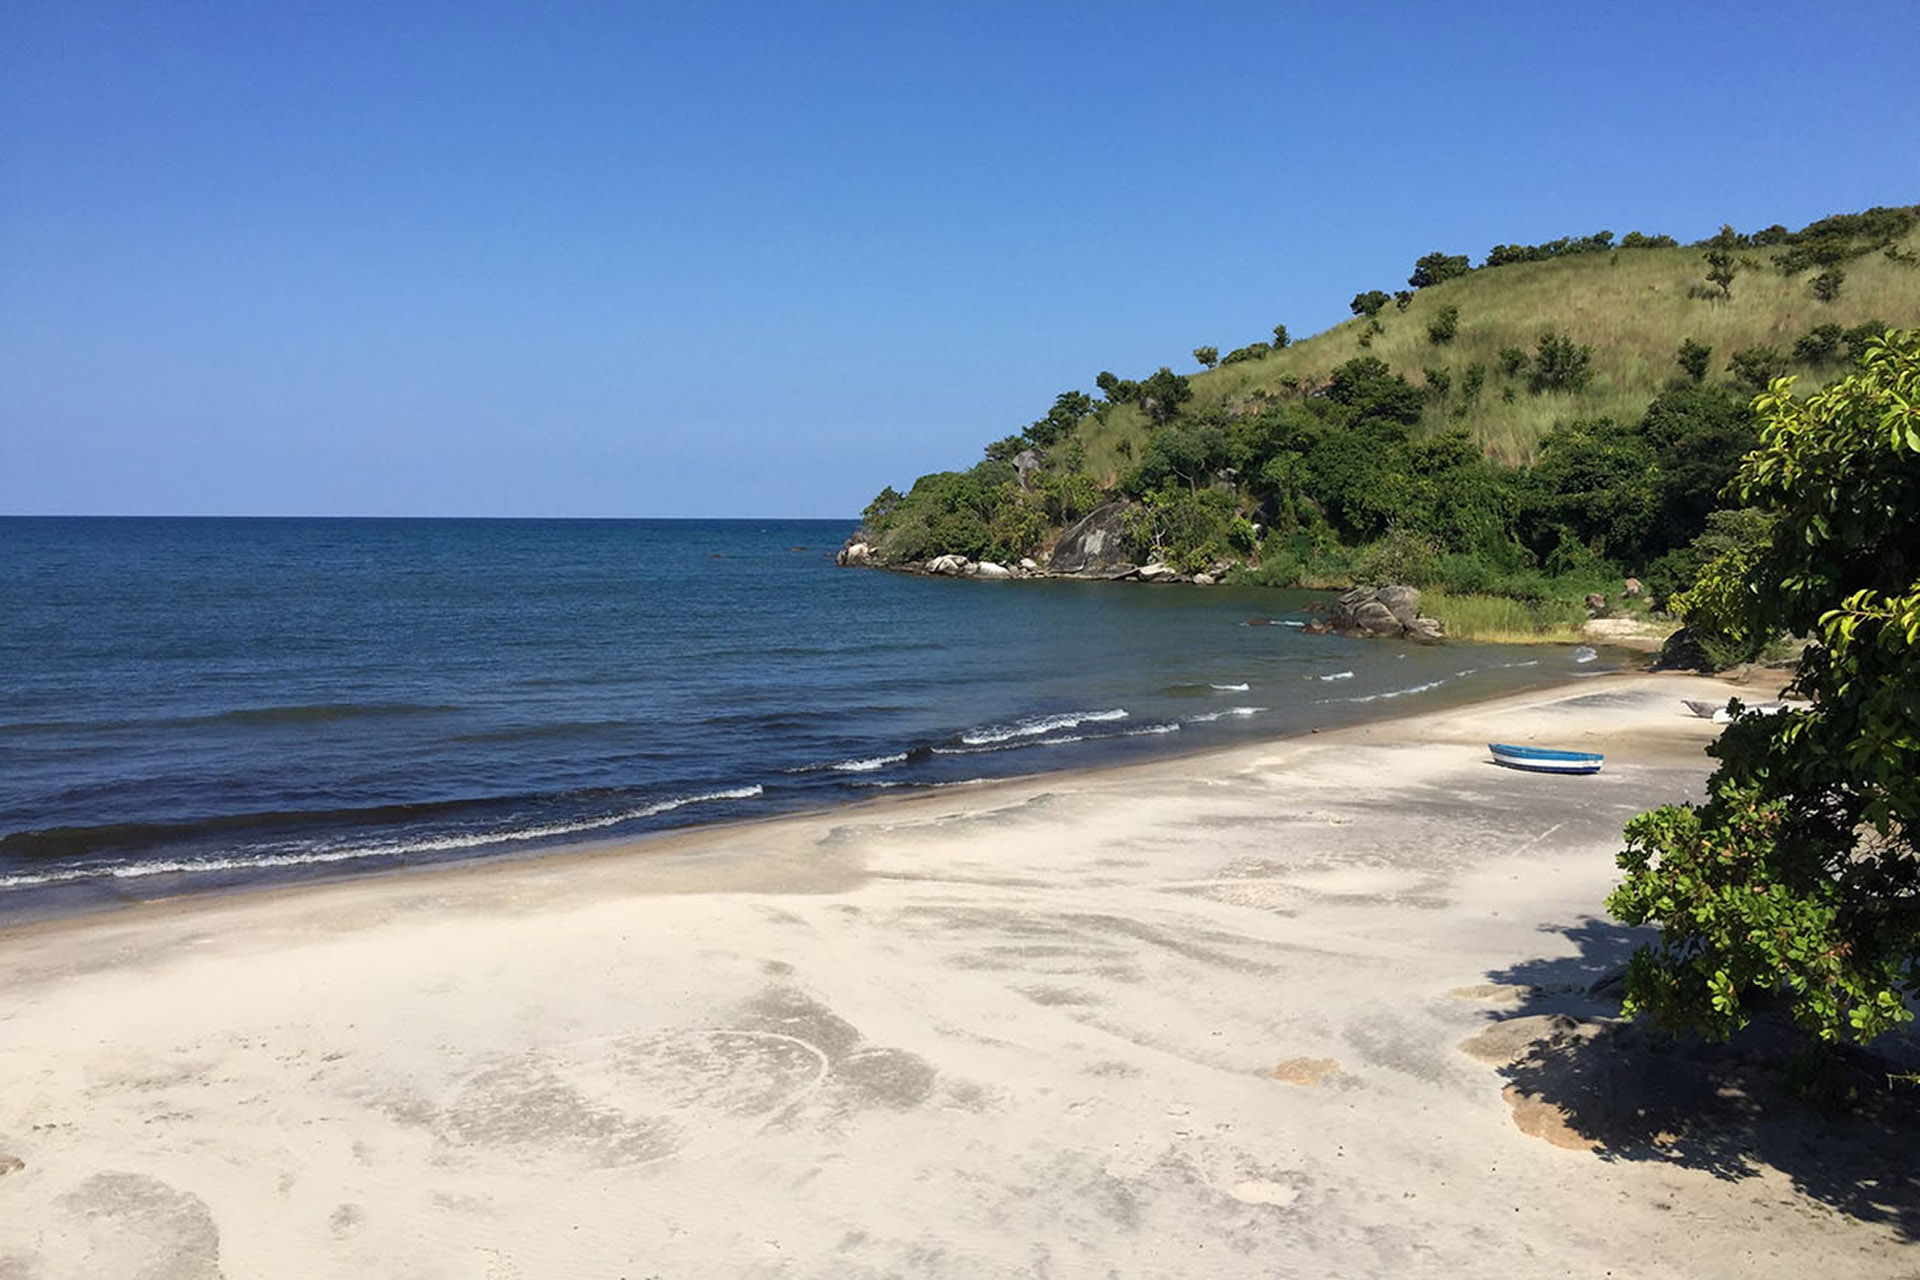 viphya plateau tours malawian-style-malawi-adventures-experiences-specialist-tour-operator-makuzi-beach-lodge-chintheche